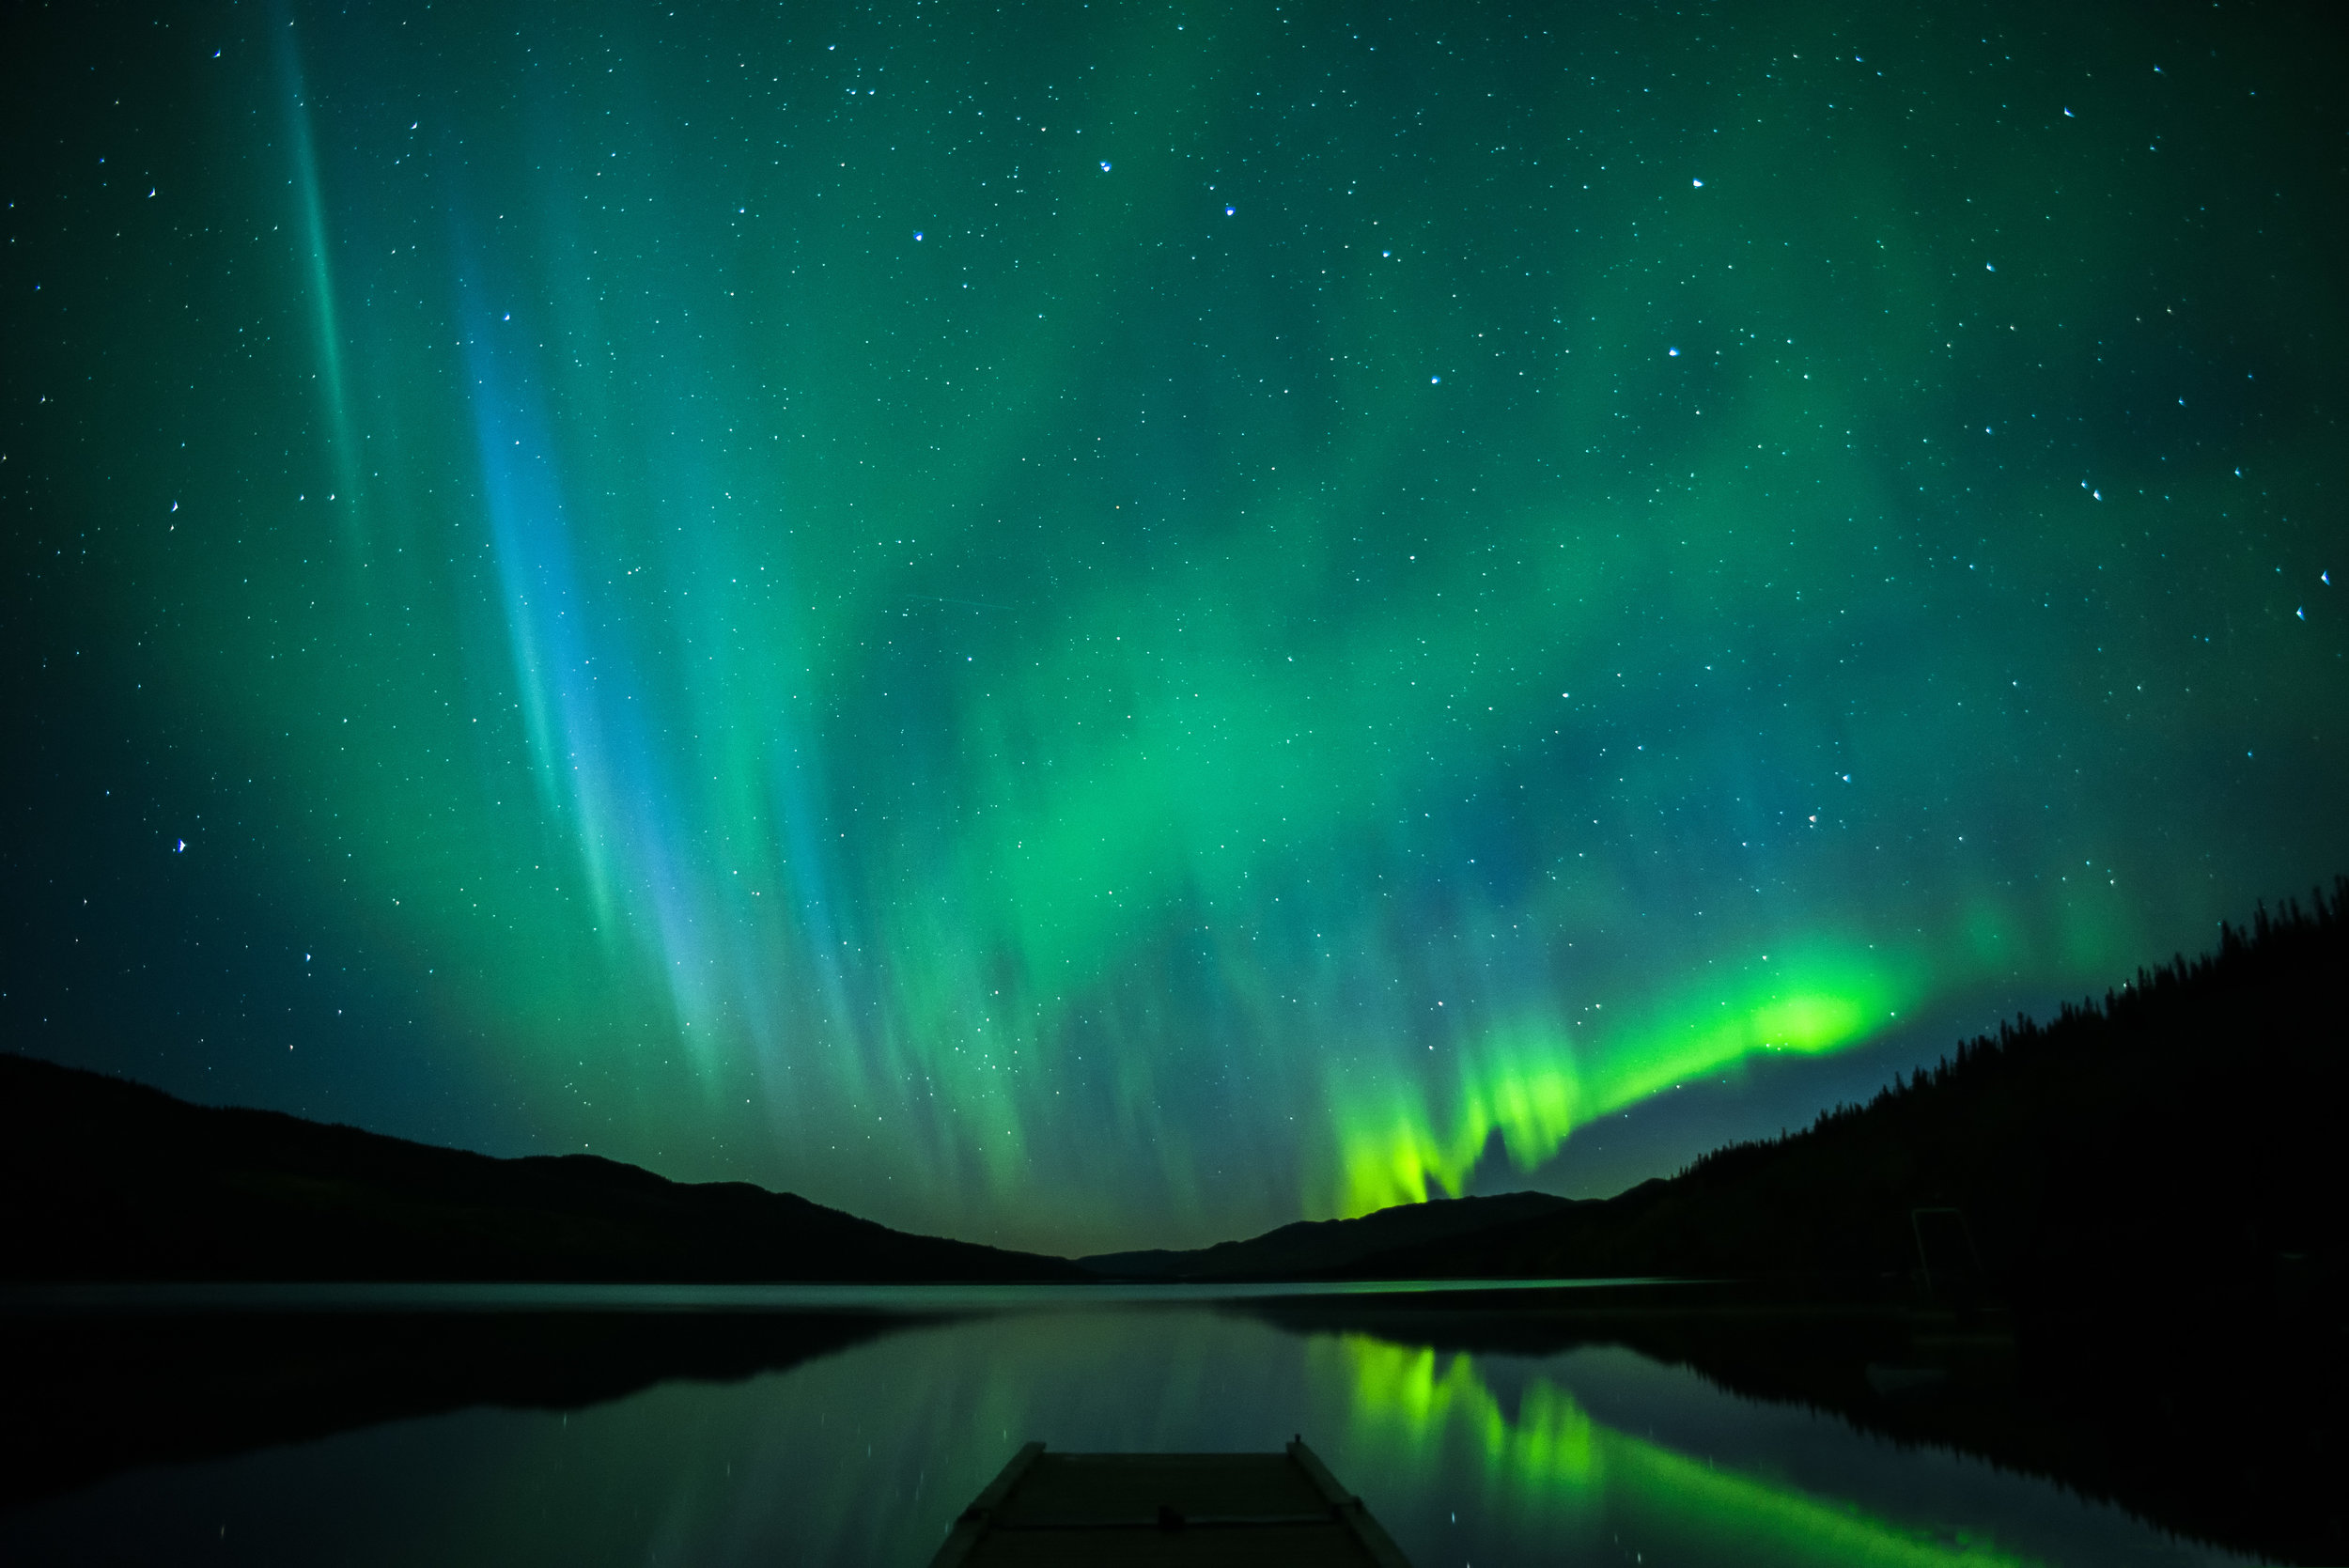 Northern lights photography workshops